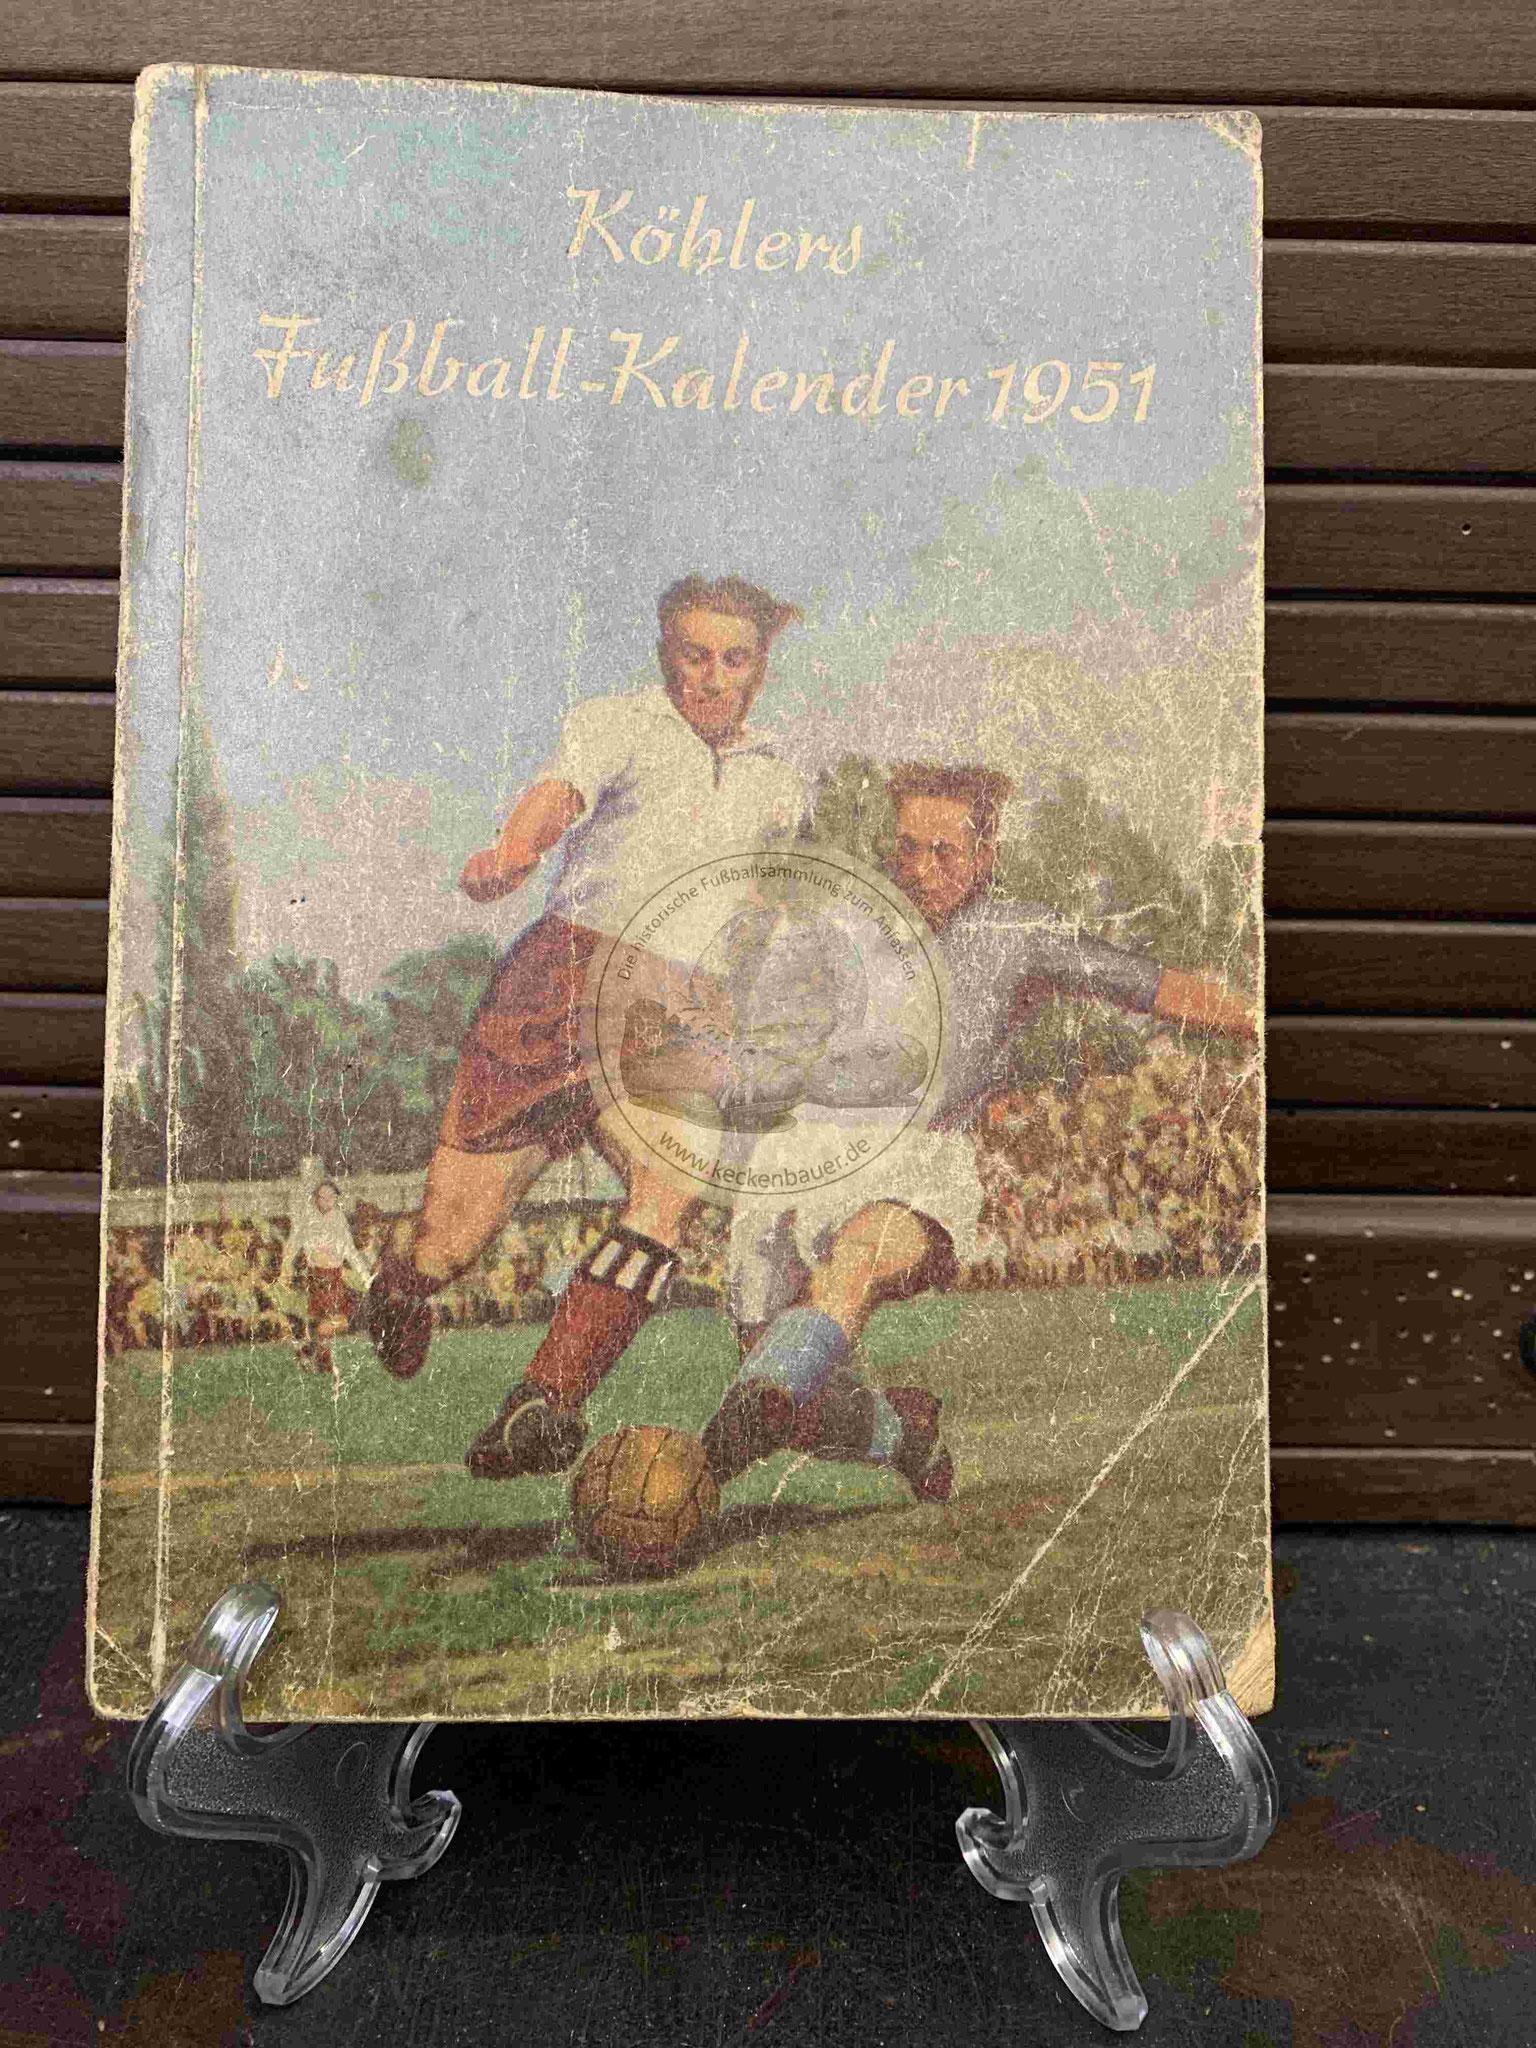 Köhlers Fußball Kelender 1951